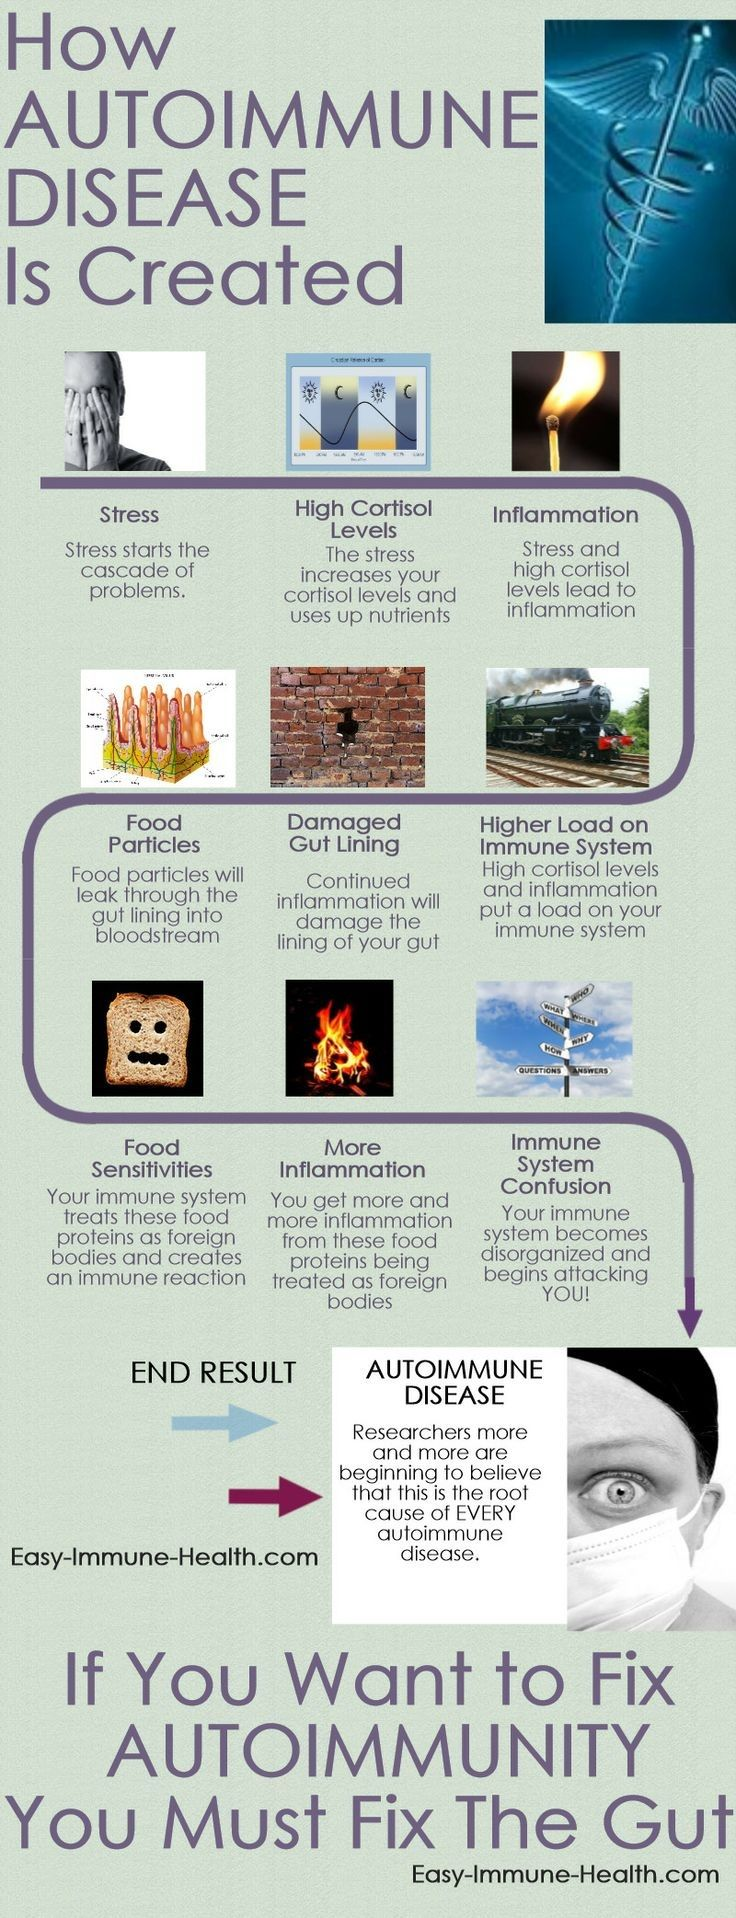 How Autoimmune Disease is Created